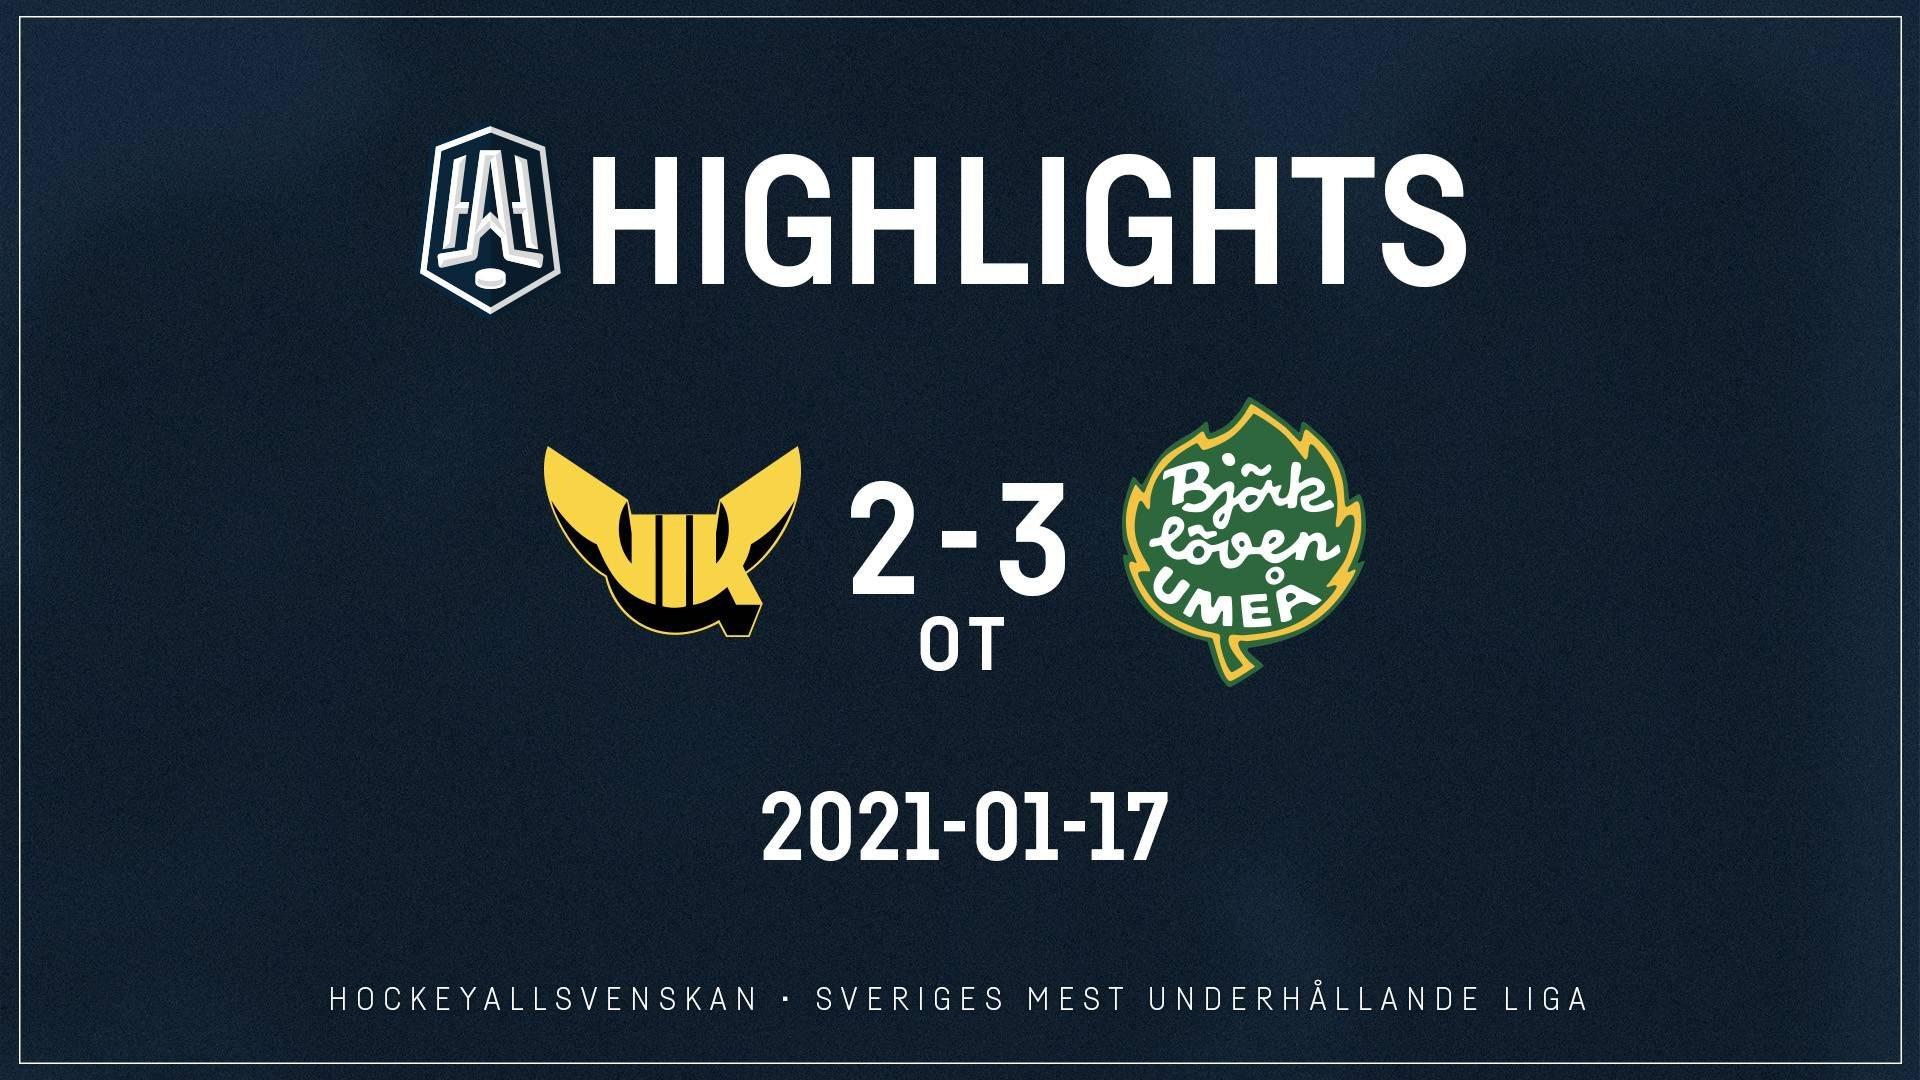 2021-01-17 Västerås - Björklöven 2-3 (OT)